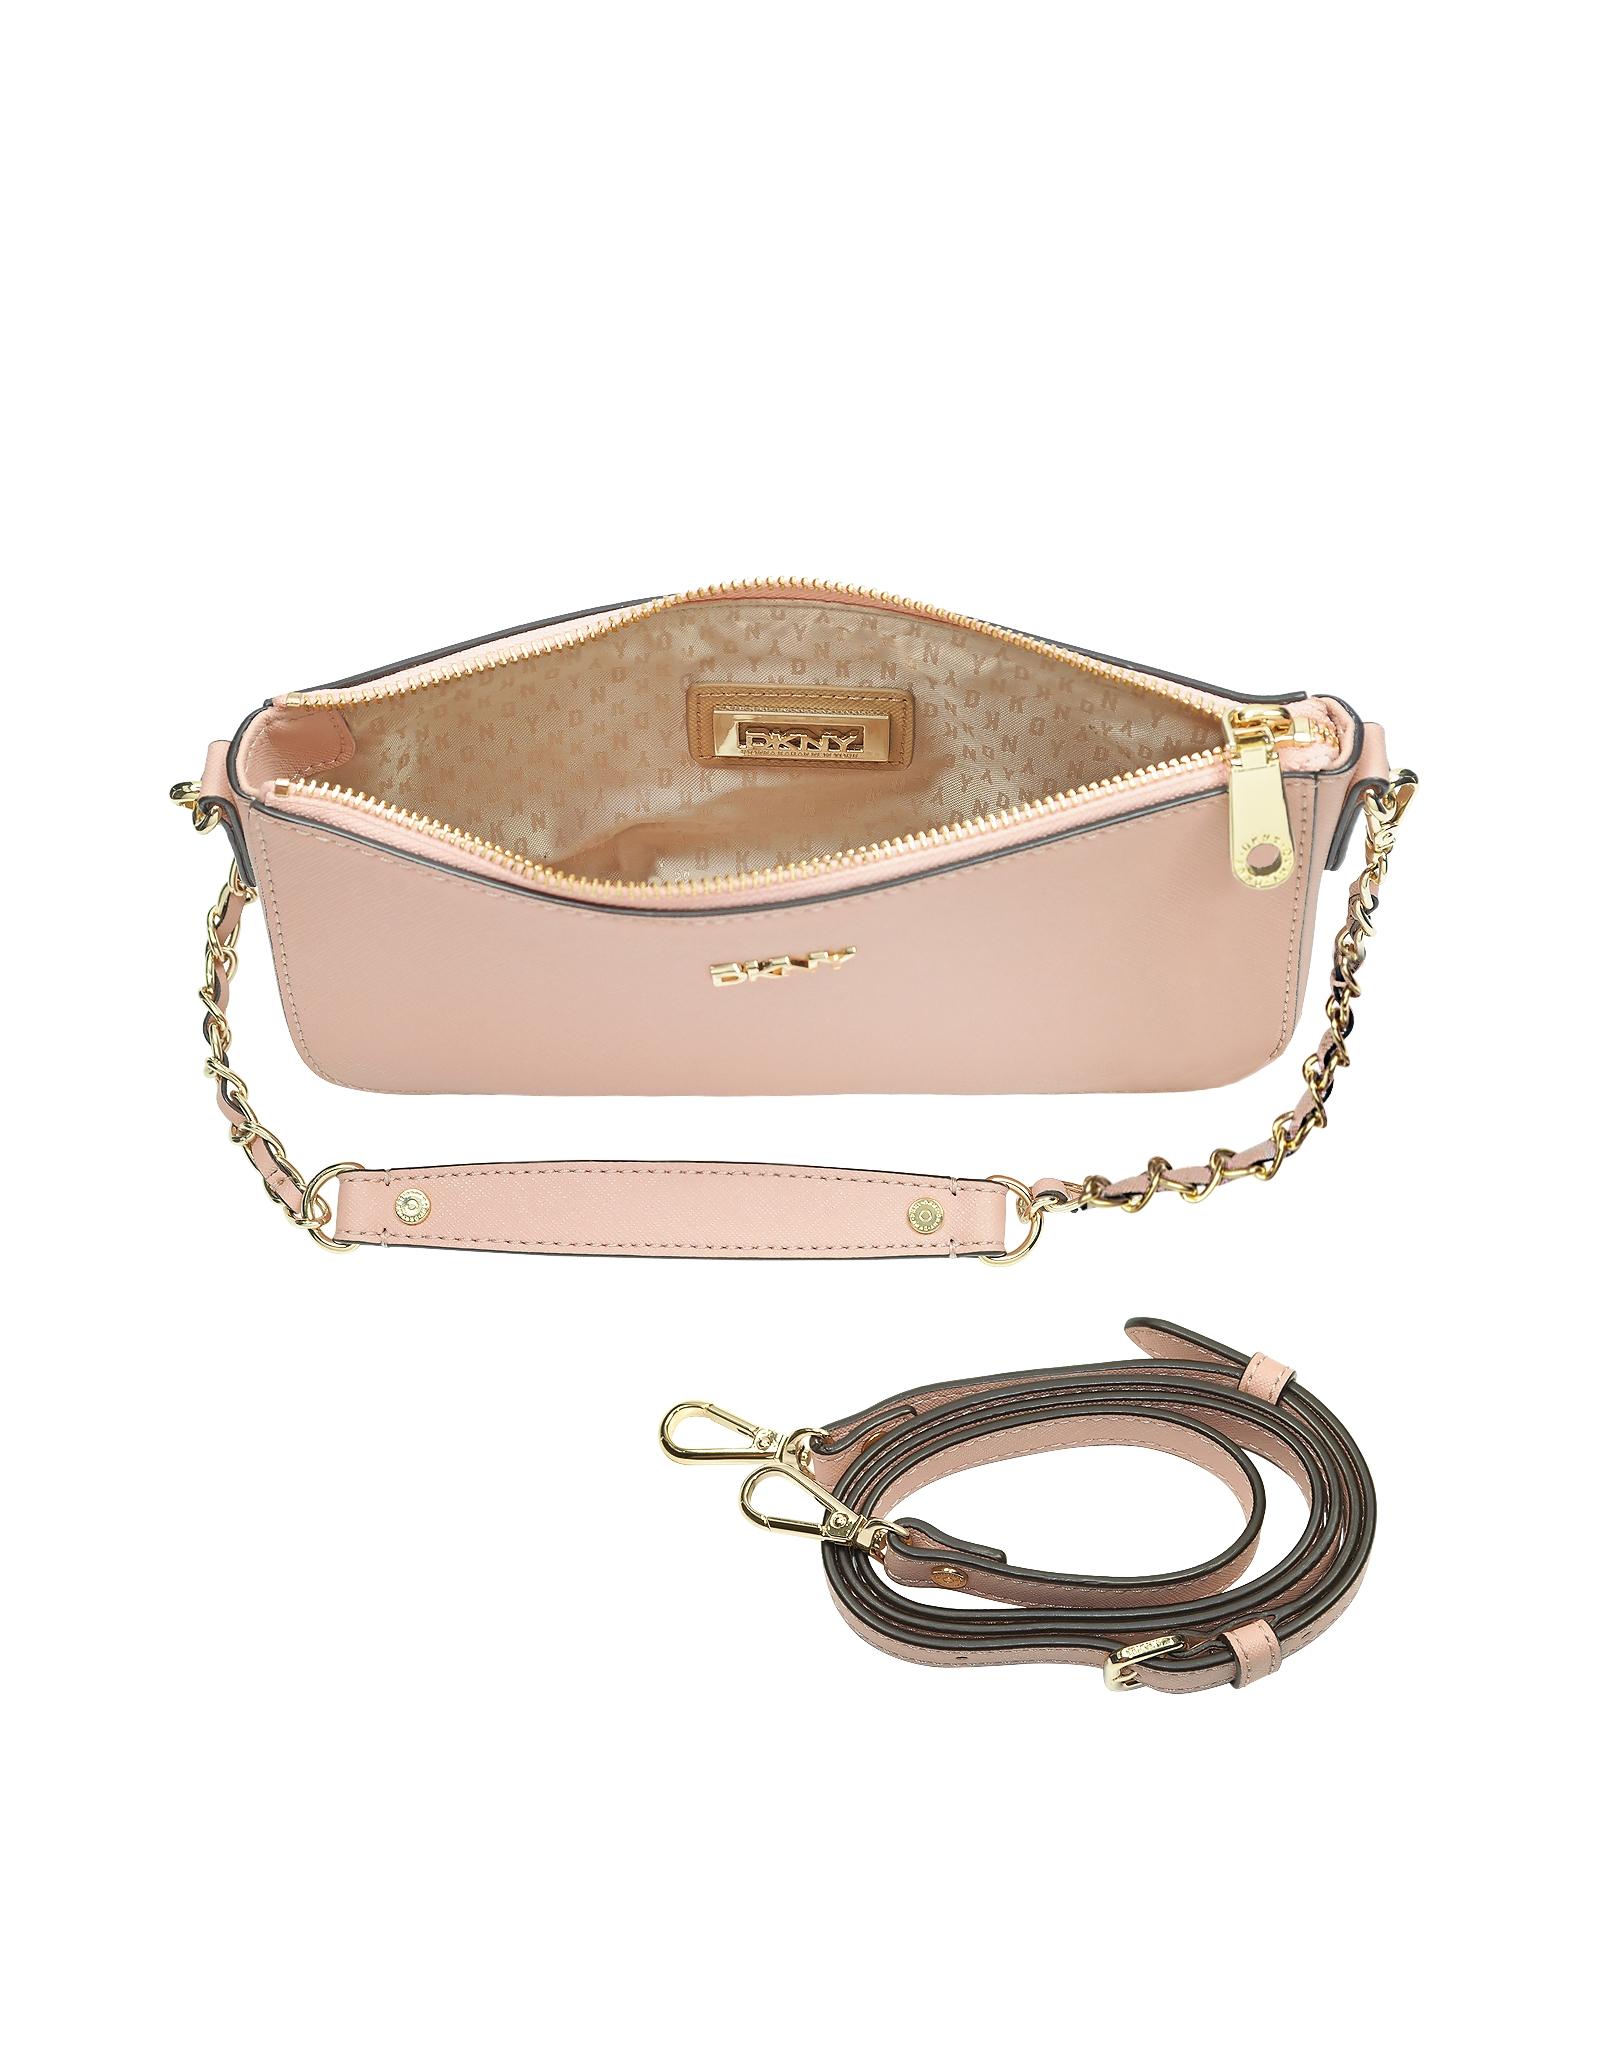 Dkny Bryant Park Blush Saffiano Leather Crossbody Bag In